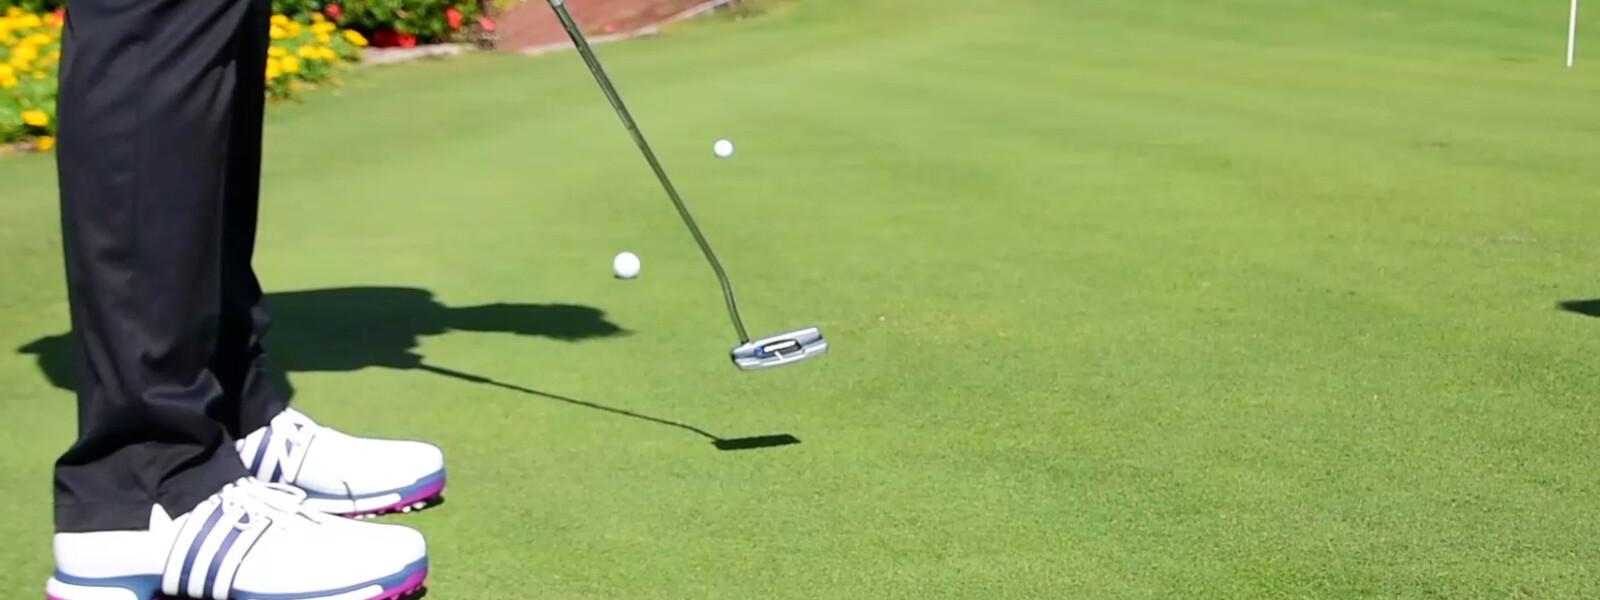 3. Golf-Trainingsvideo: Putting Richtungsweisend